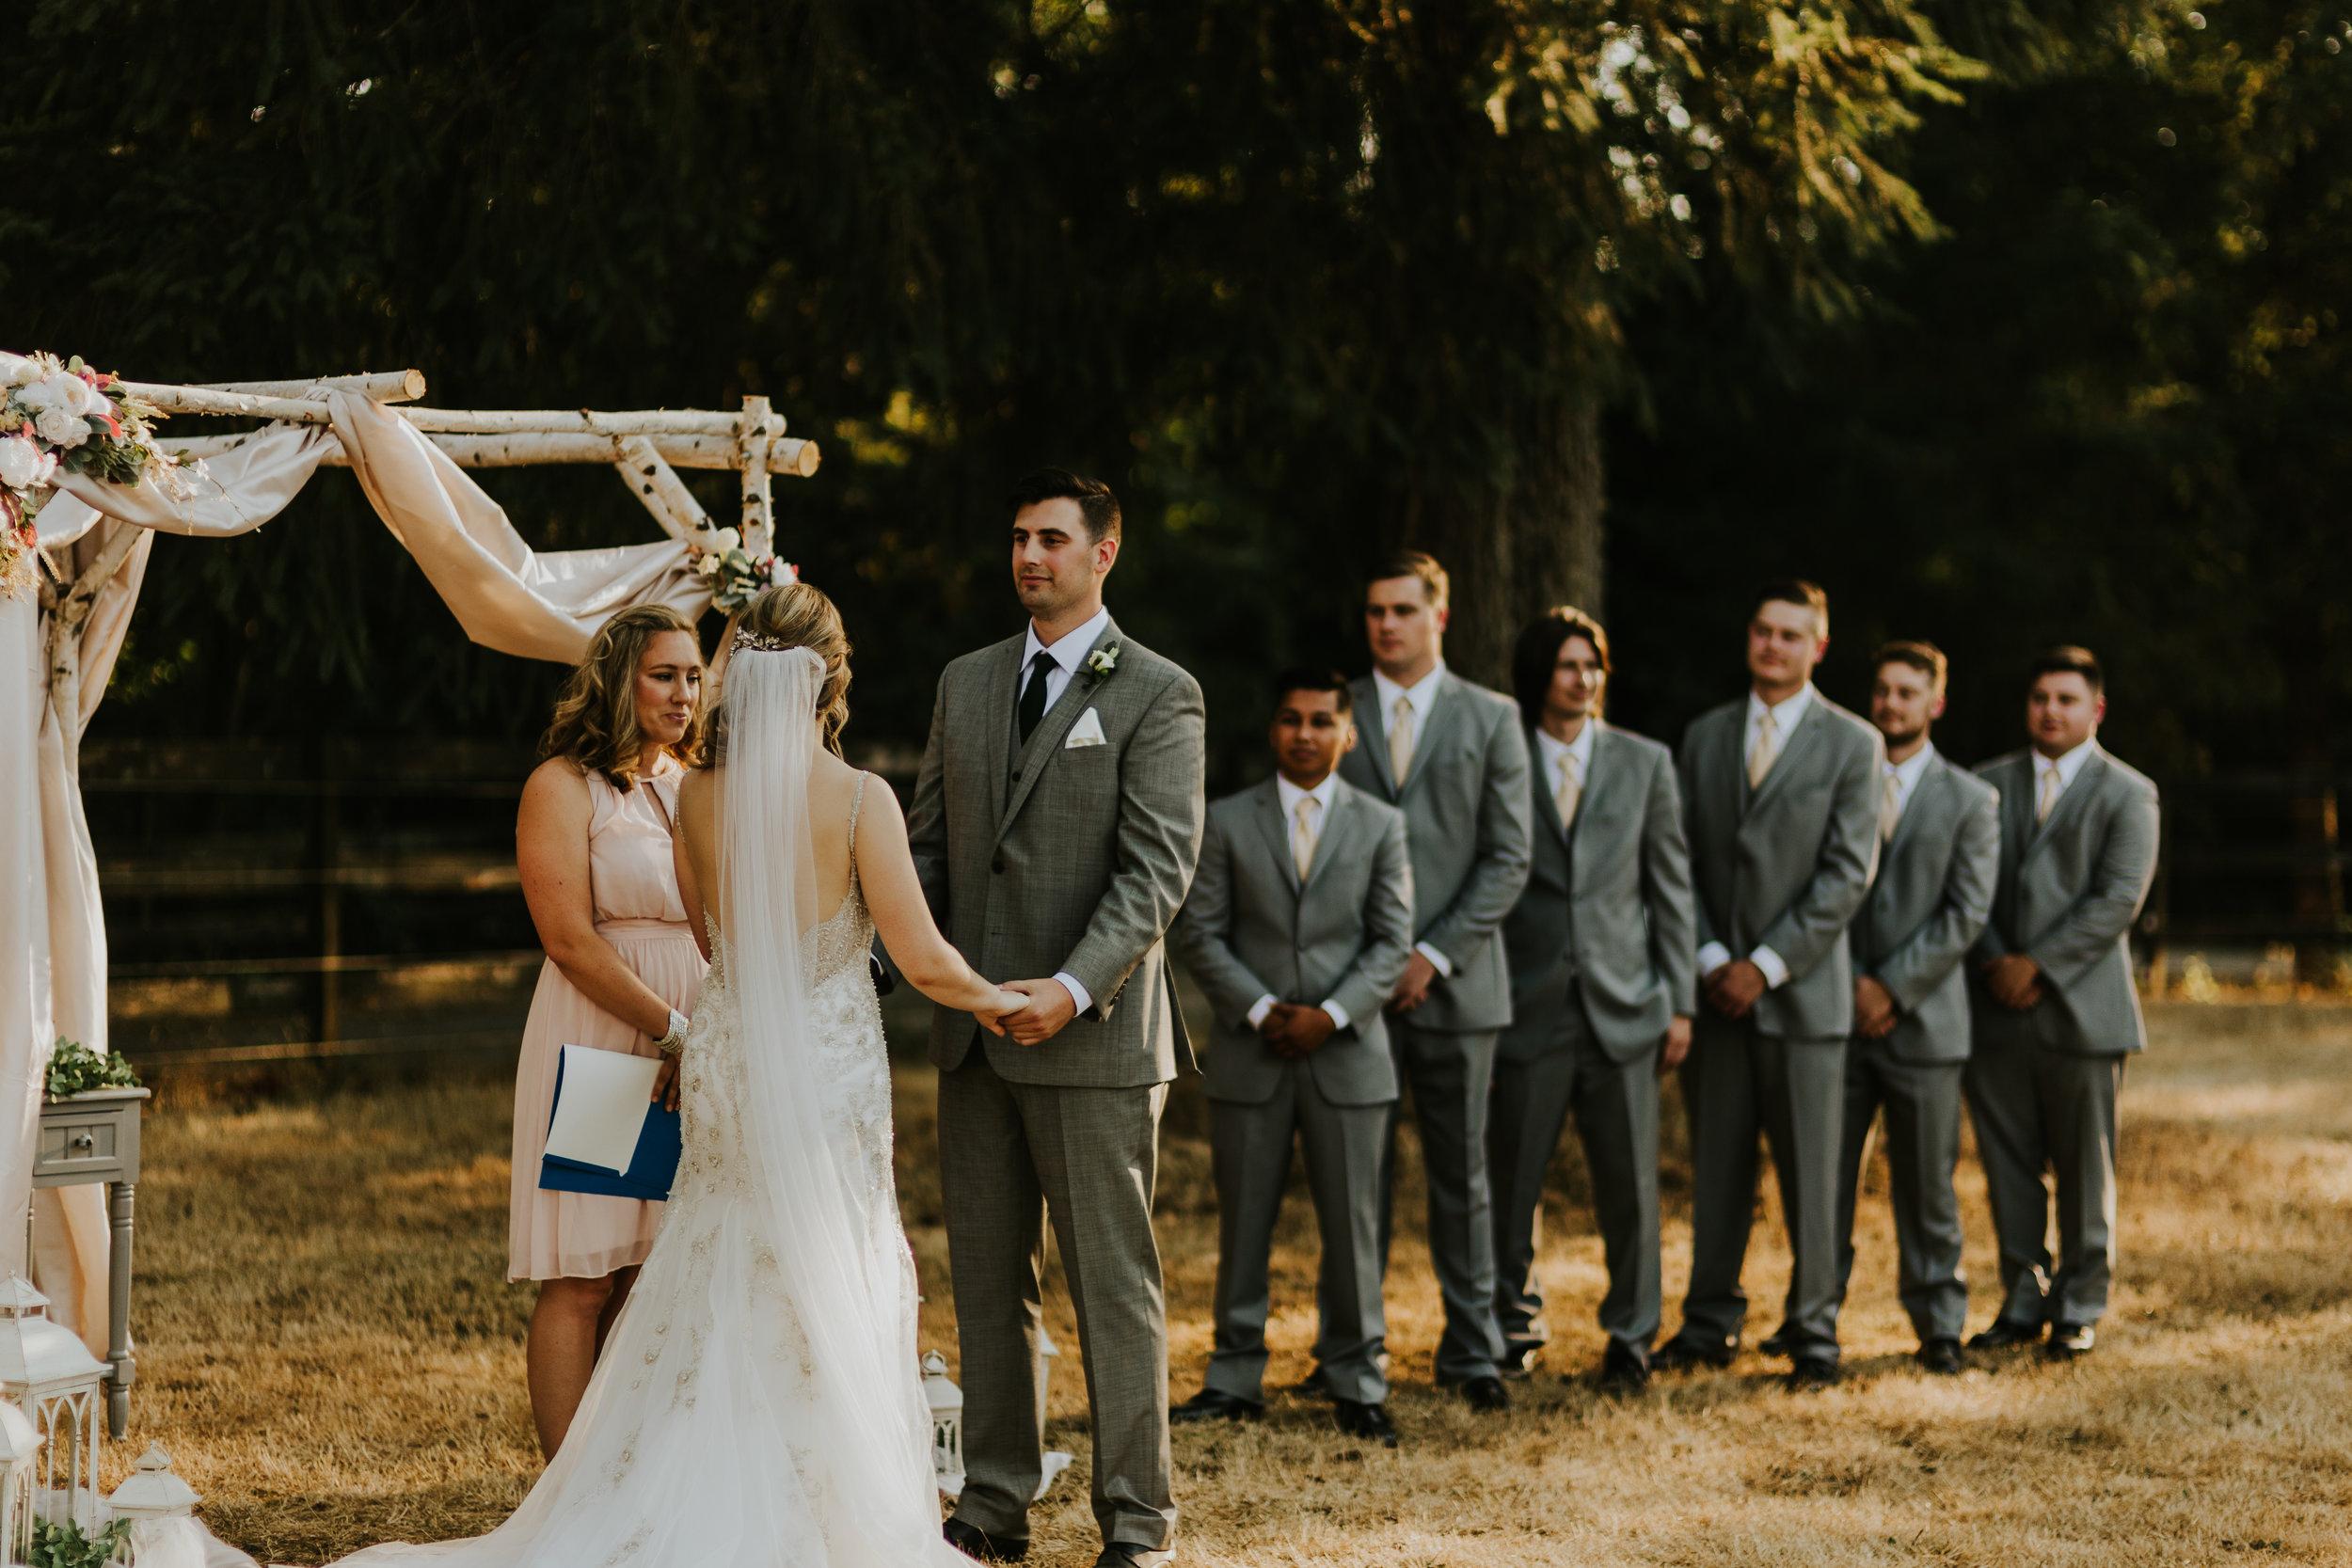 MJ and Jon backyard battleground washington wedding van gachnang